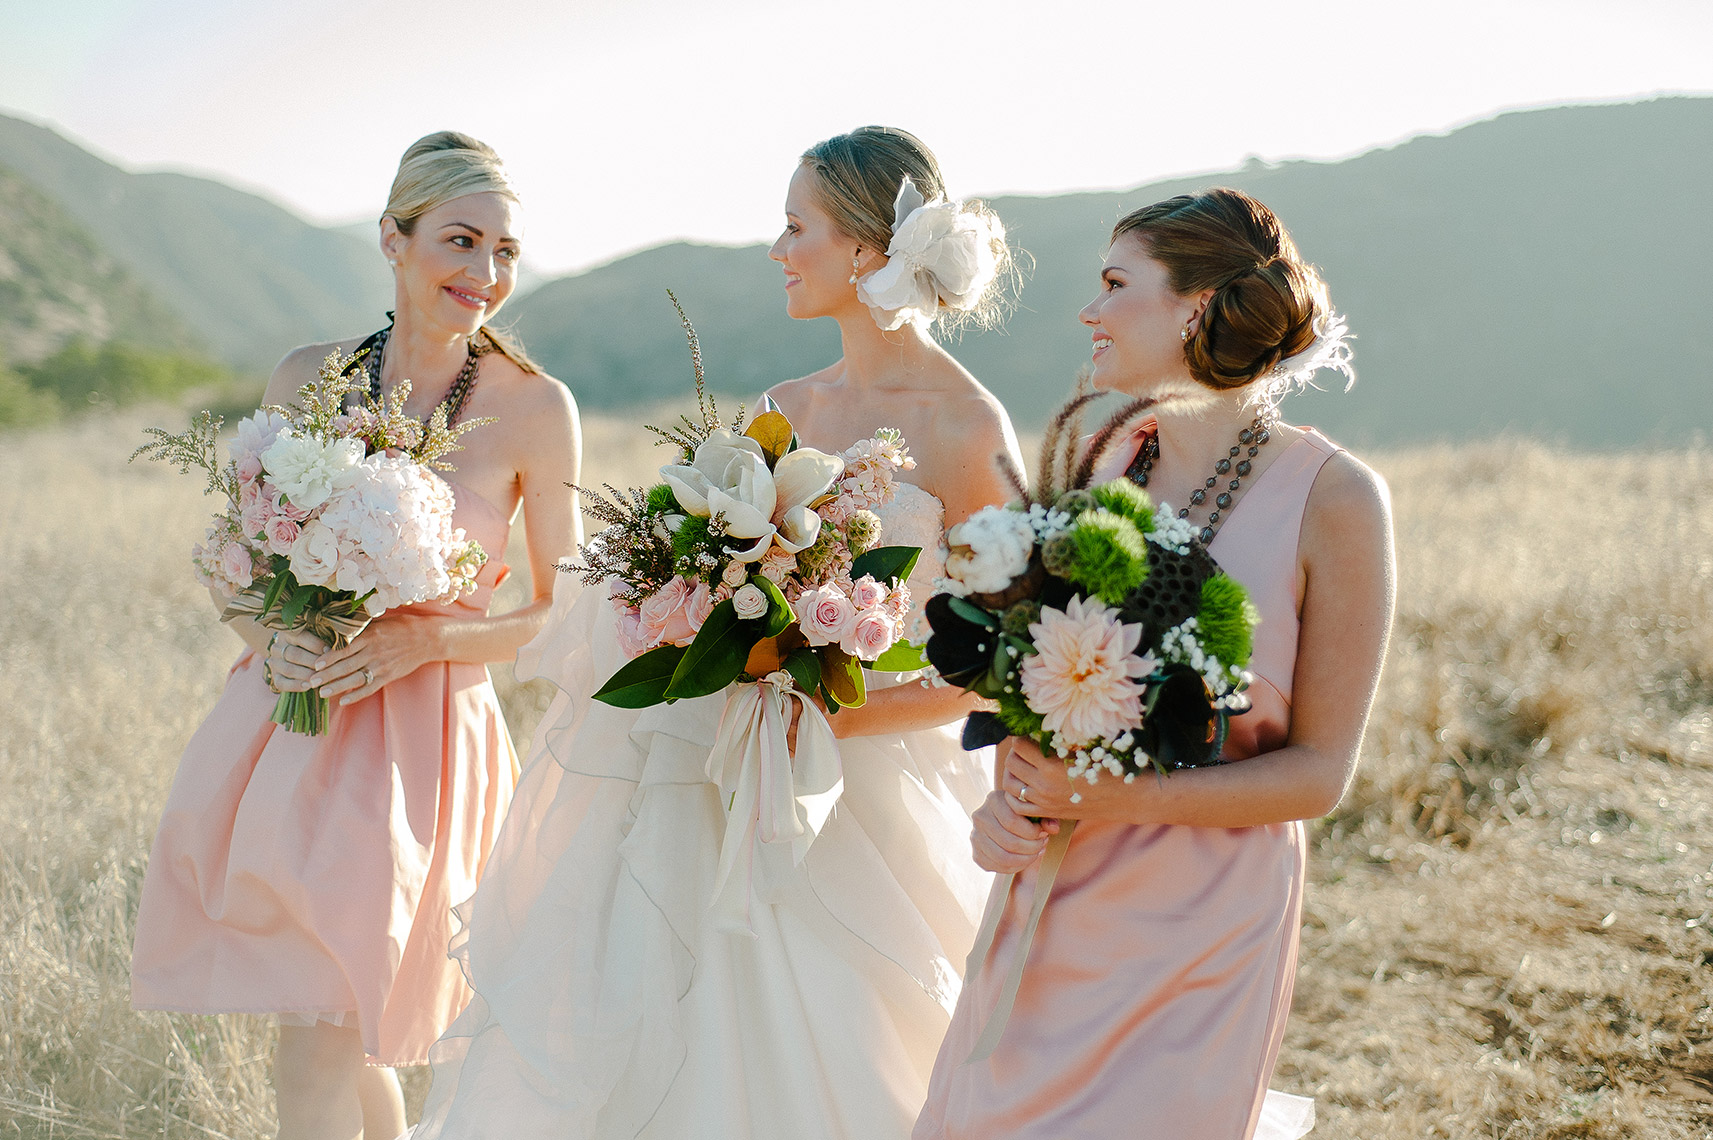 john-schnack-photography-san-diego-wedding-inspiration-shoot-back-country-vintage-wedding-37.jpg